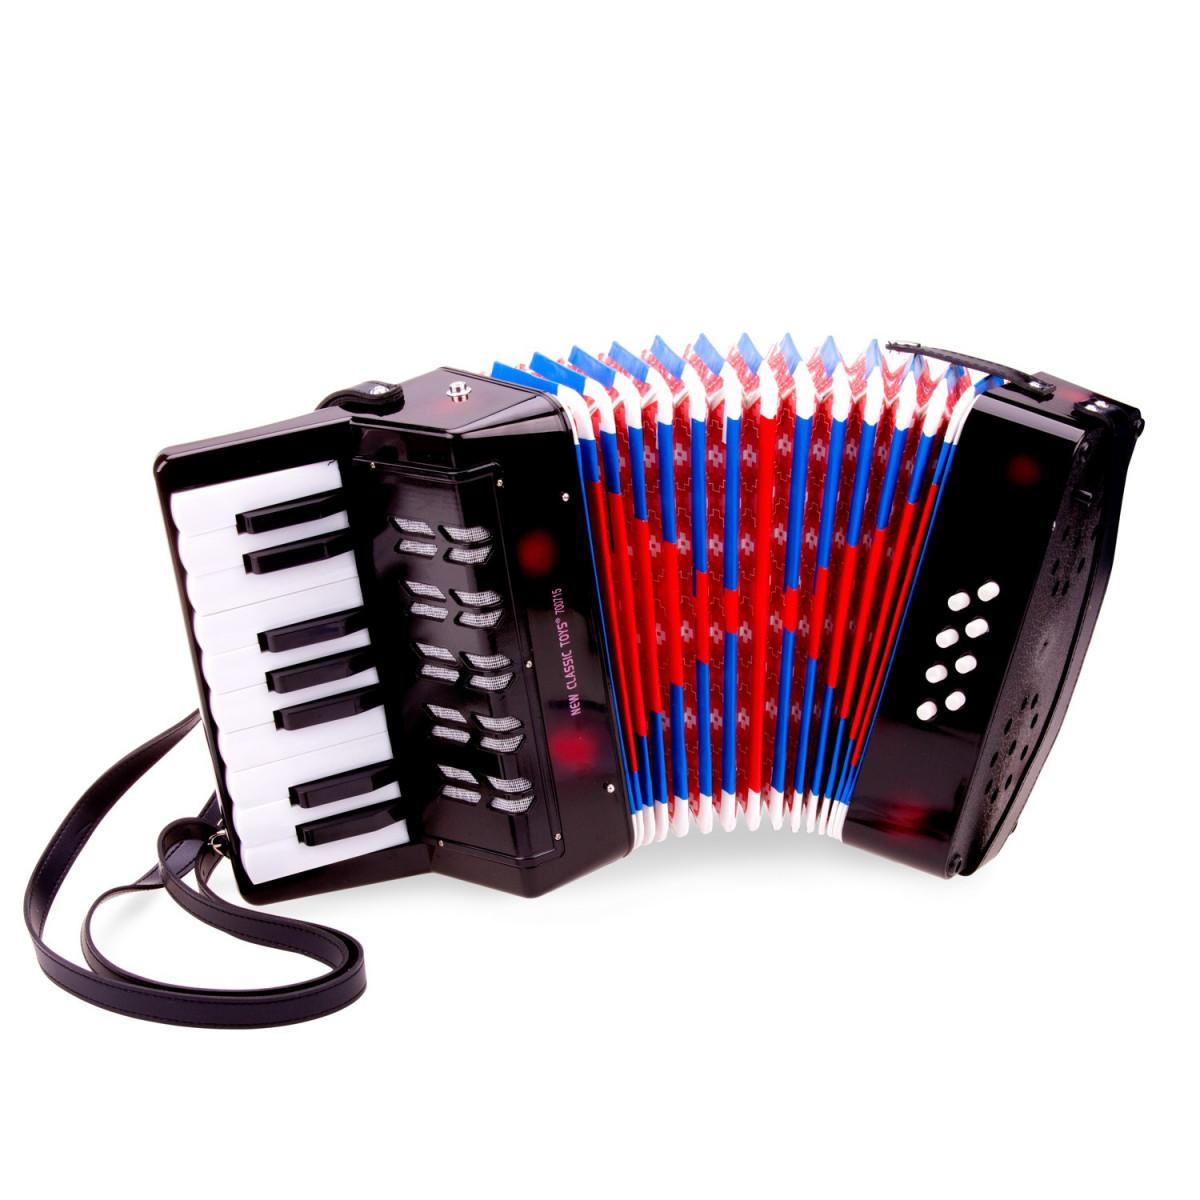 Accordéon jouet Clavier - Grand